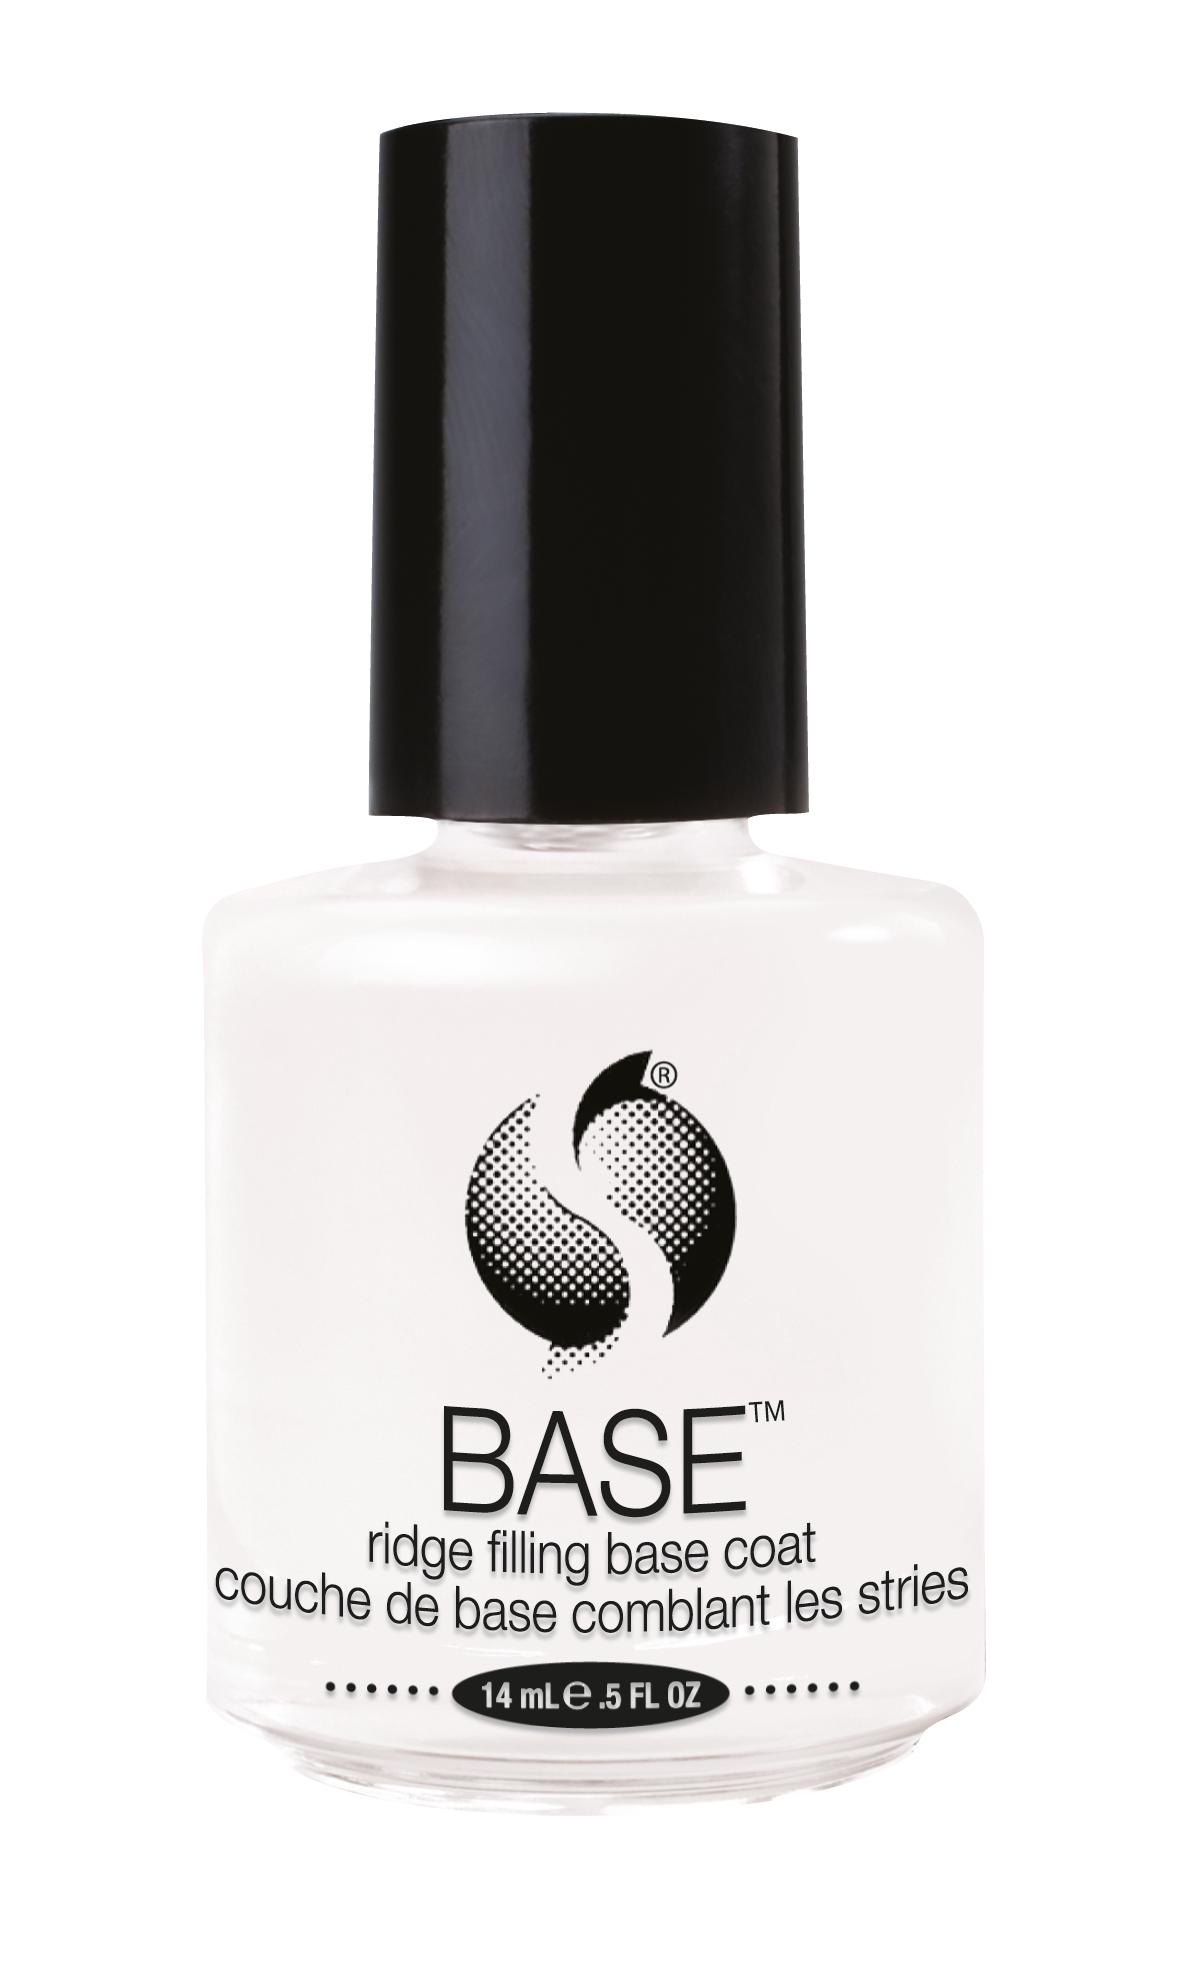 Seche Base Ridge filling base coat